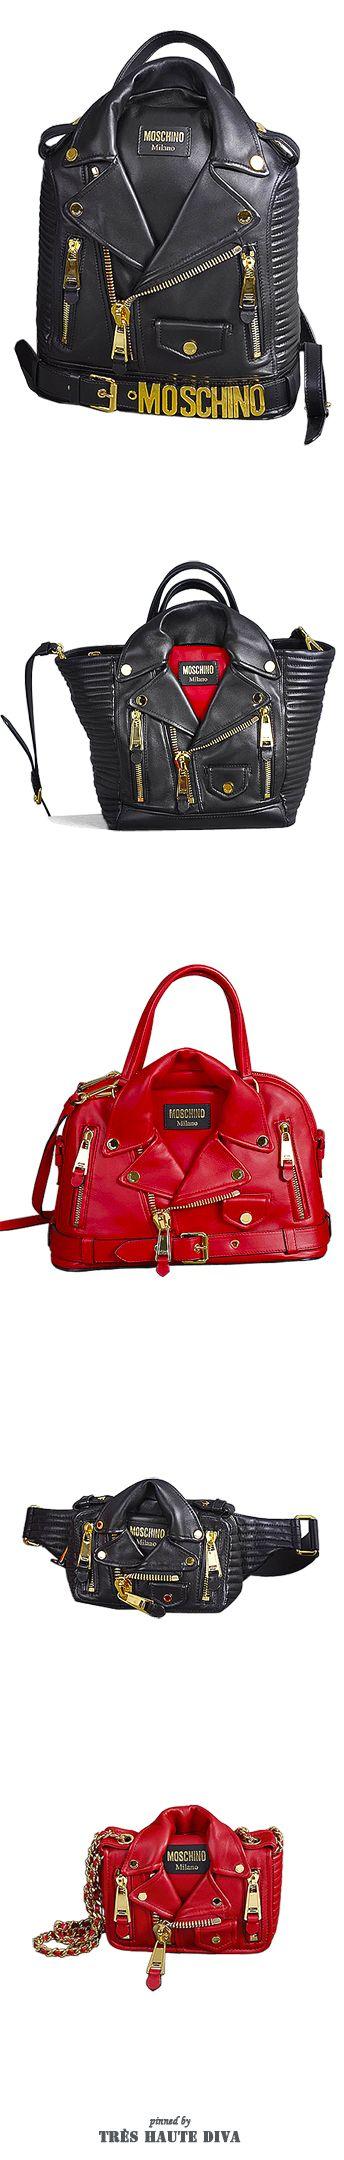 Moschino | www.moschino.com/... Clothing, Shoes  Jewelry : Women : Handbags  Wallets : Womens Handbags  Wallets hhttp://amzn.to/2lIKw3n